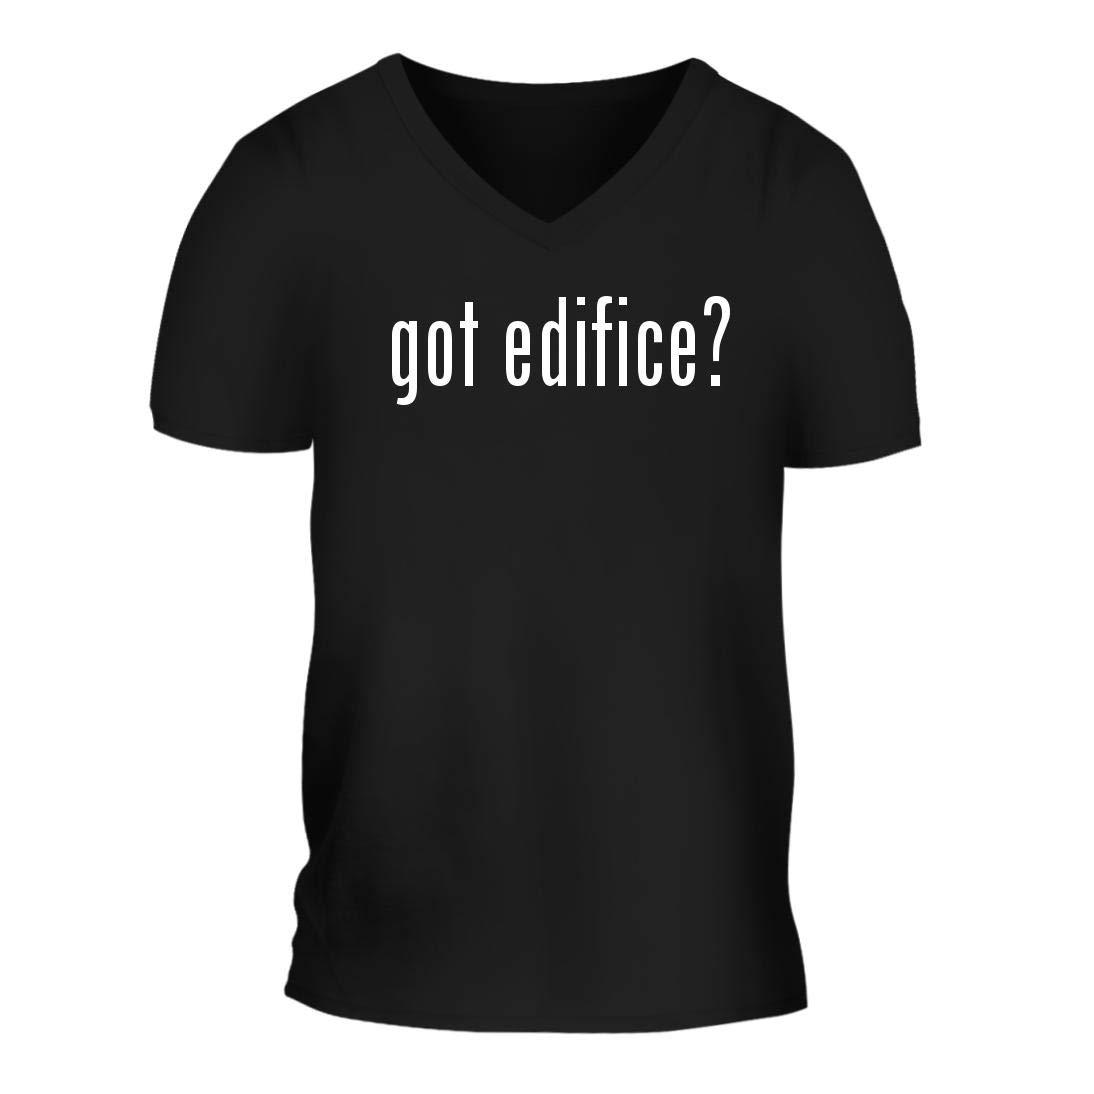 got Edifice? - A Nice Men's Short Sleeve V-Neck T-Shirt Shirt, Black, Large